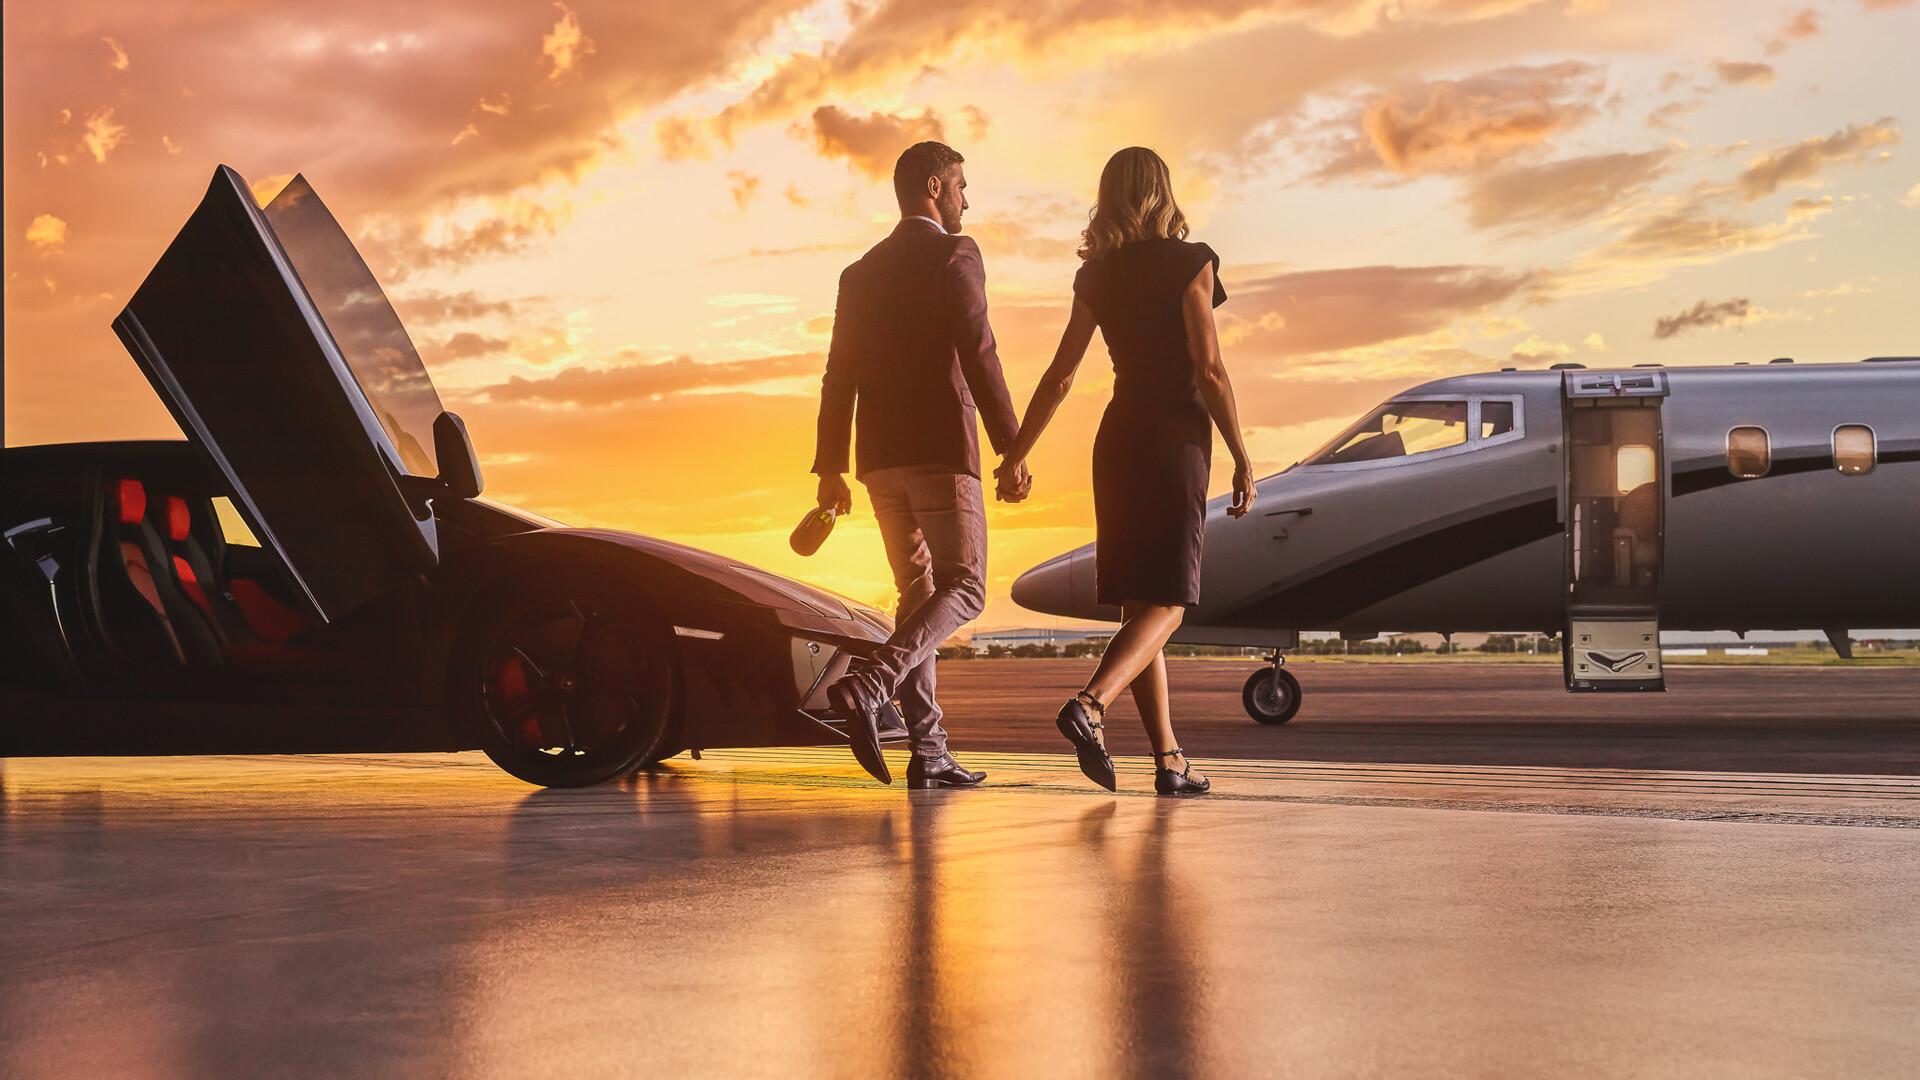 1920x1080 Lamborghini Business Private Jet Married Couple